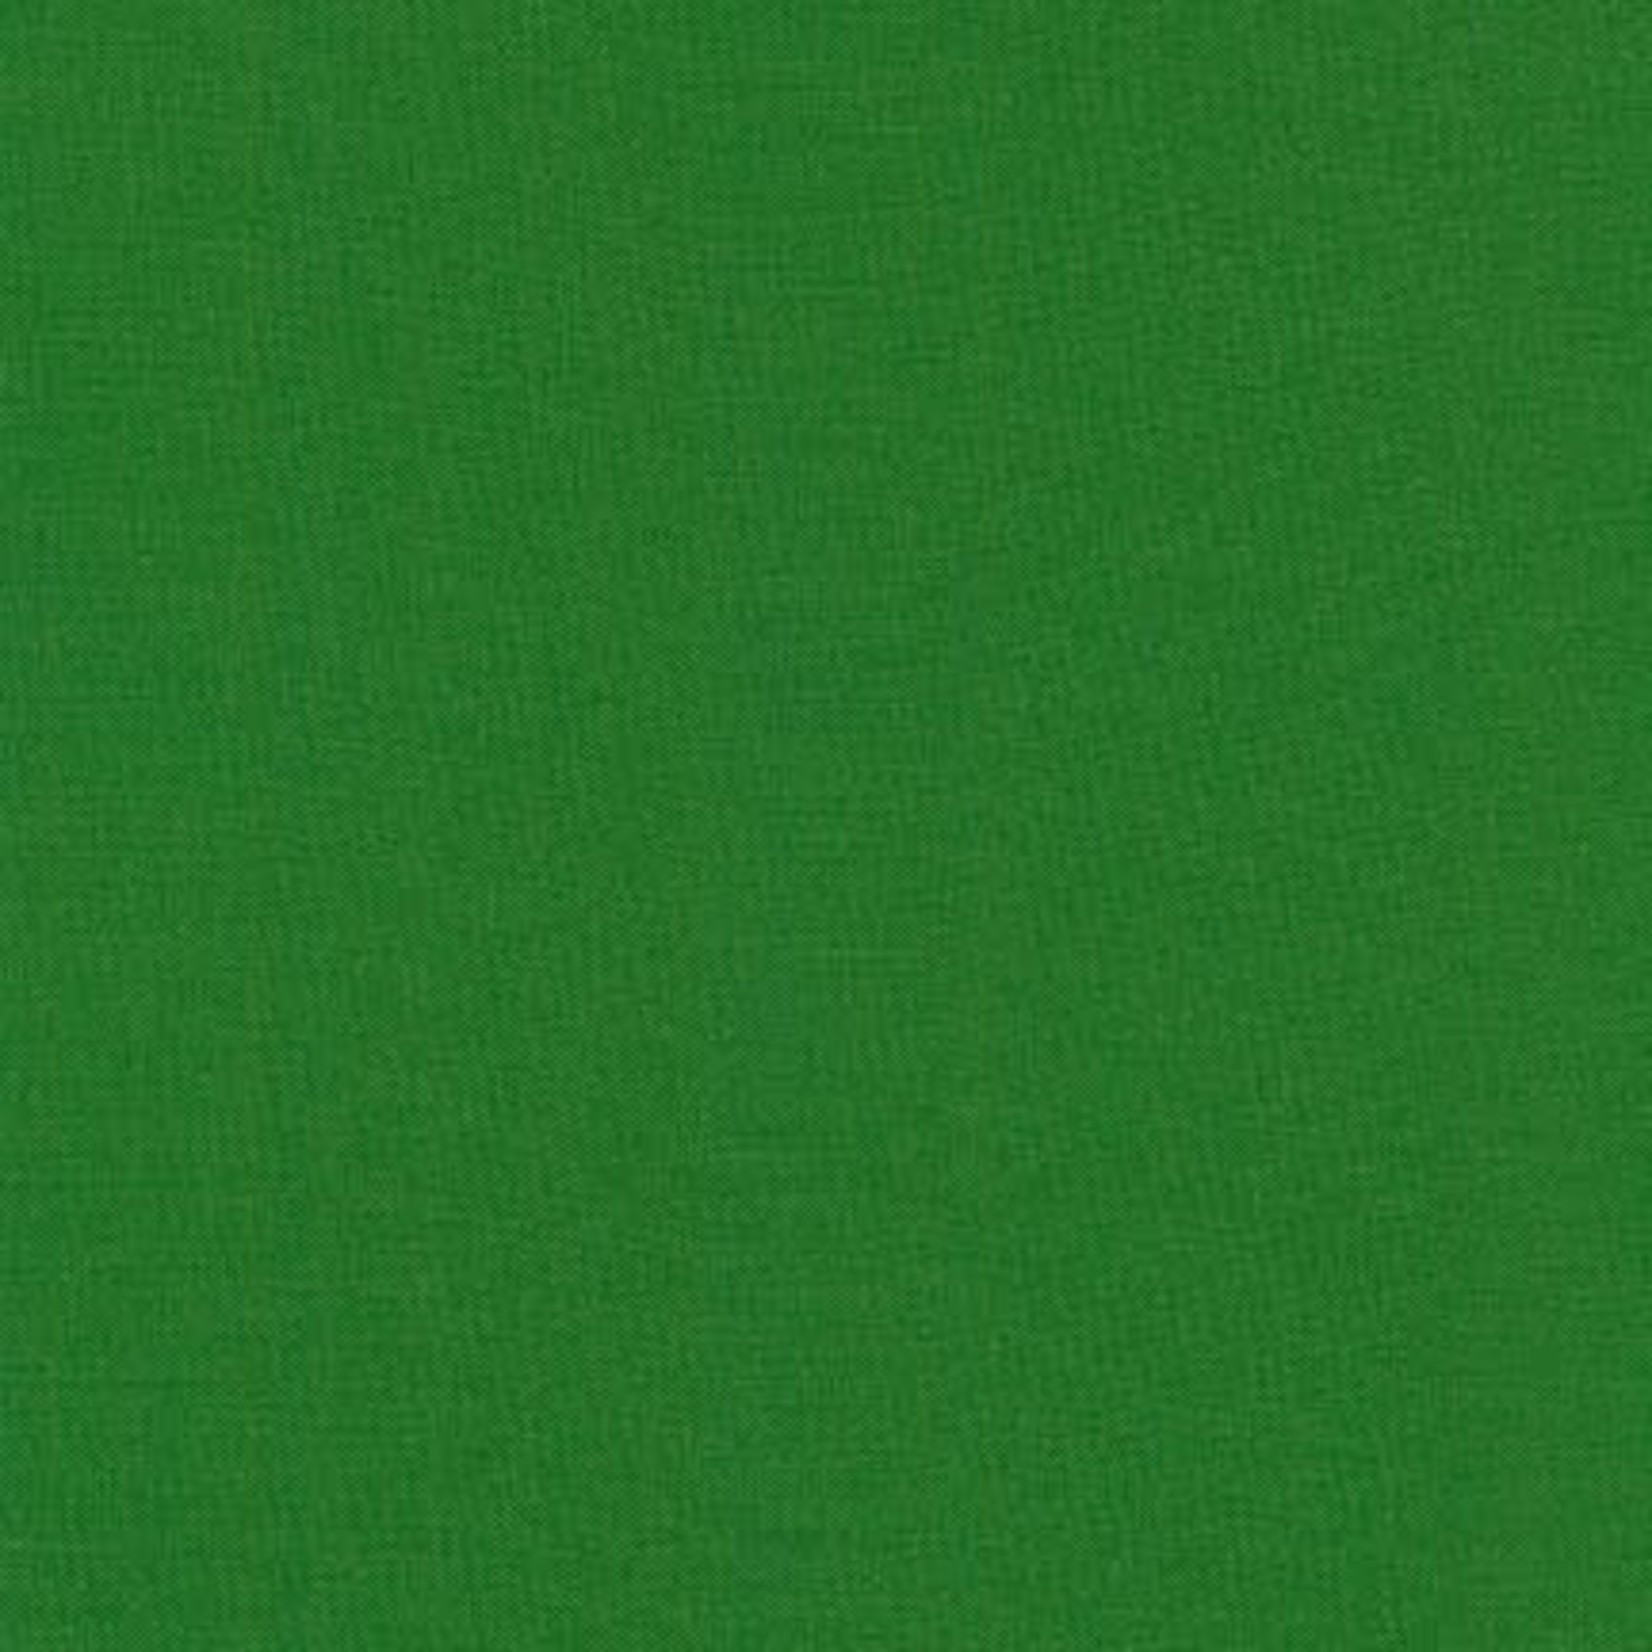 KONA KONA  K001-147 JUNGLE, PER CM OR $14/M